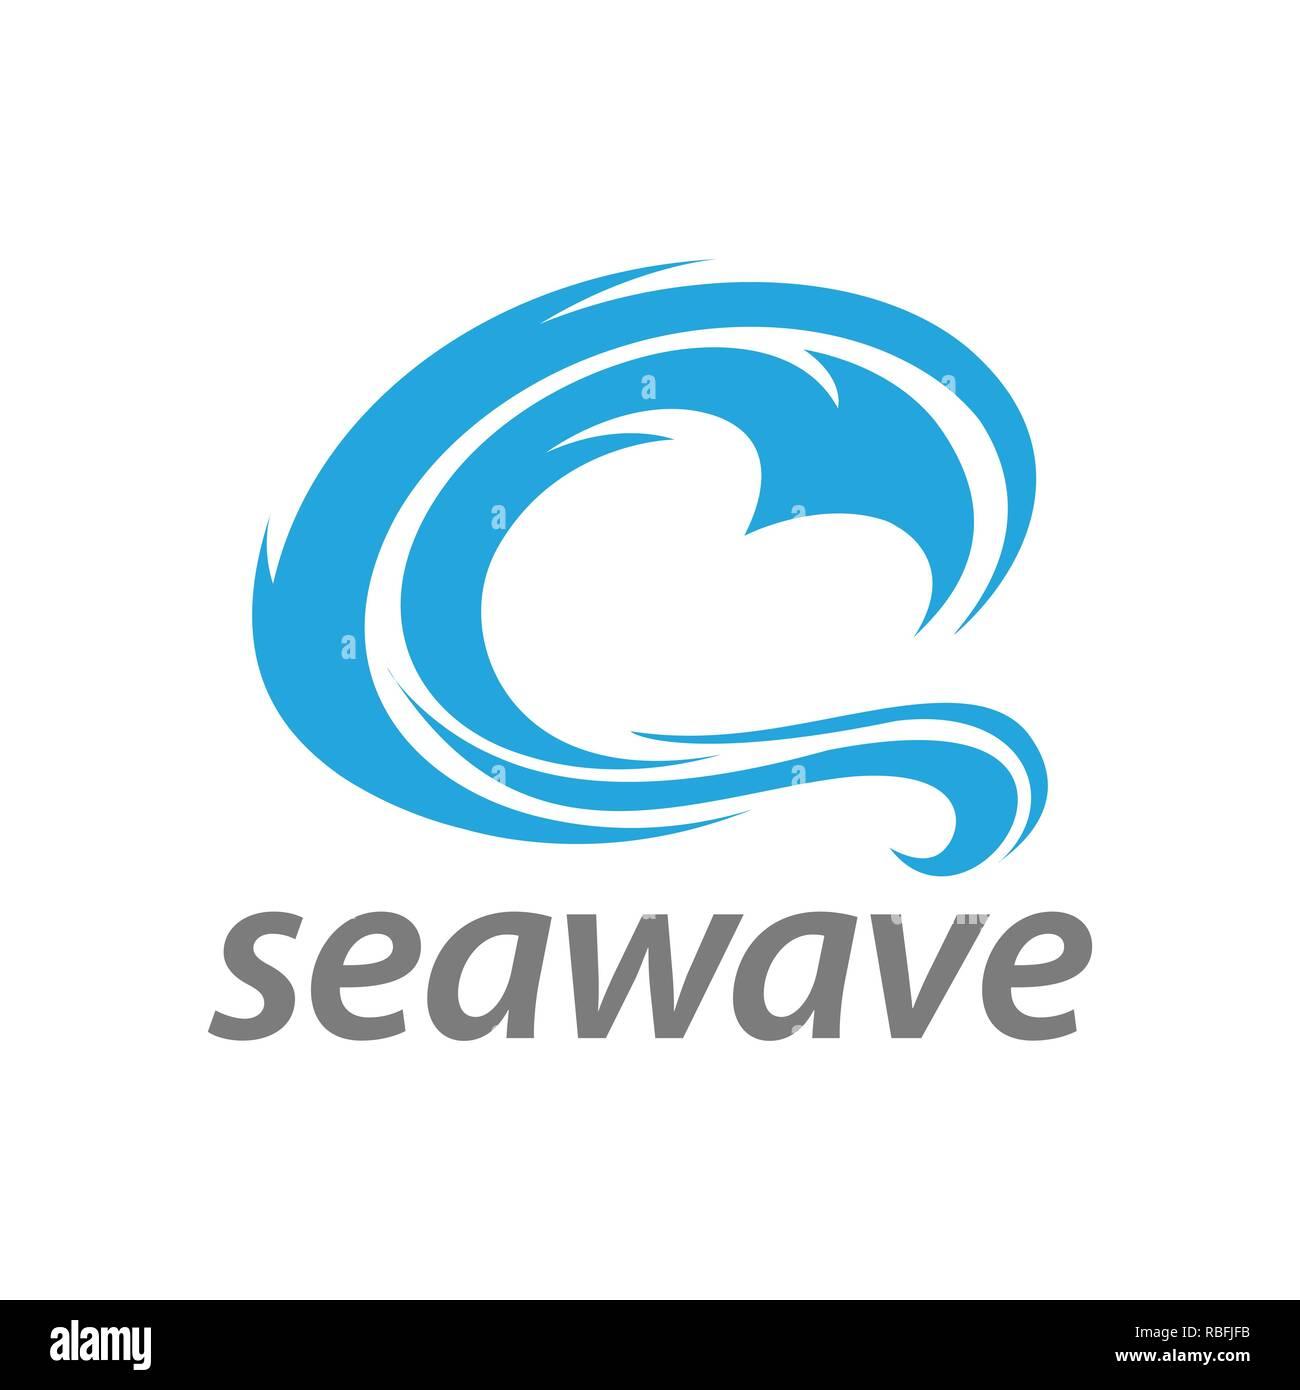 Abstract illustration blue sea wave logo concept design template idea - Stock Image